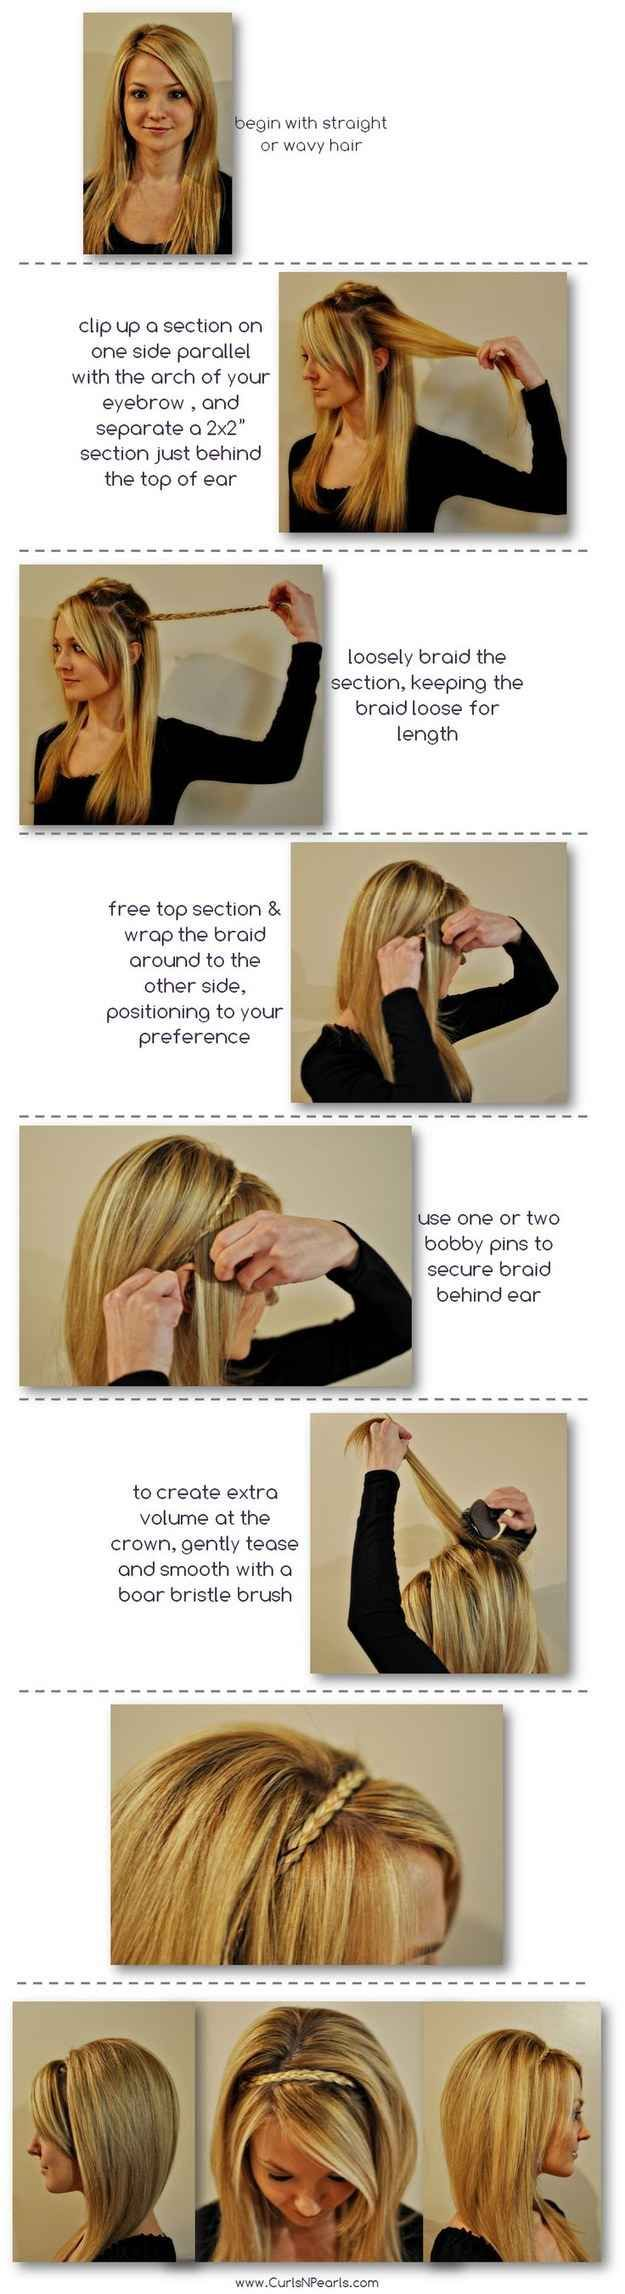 The Headband Braid | 23 Creative Braid Tutorials That Are Deceptively Easy